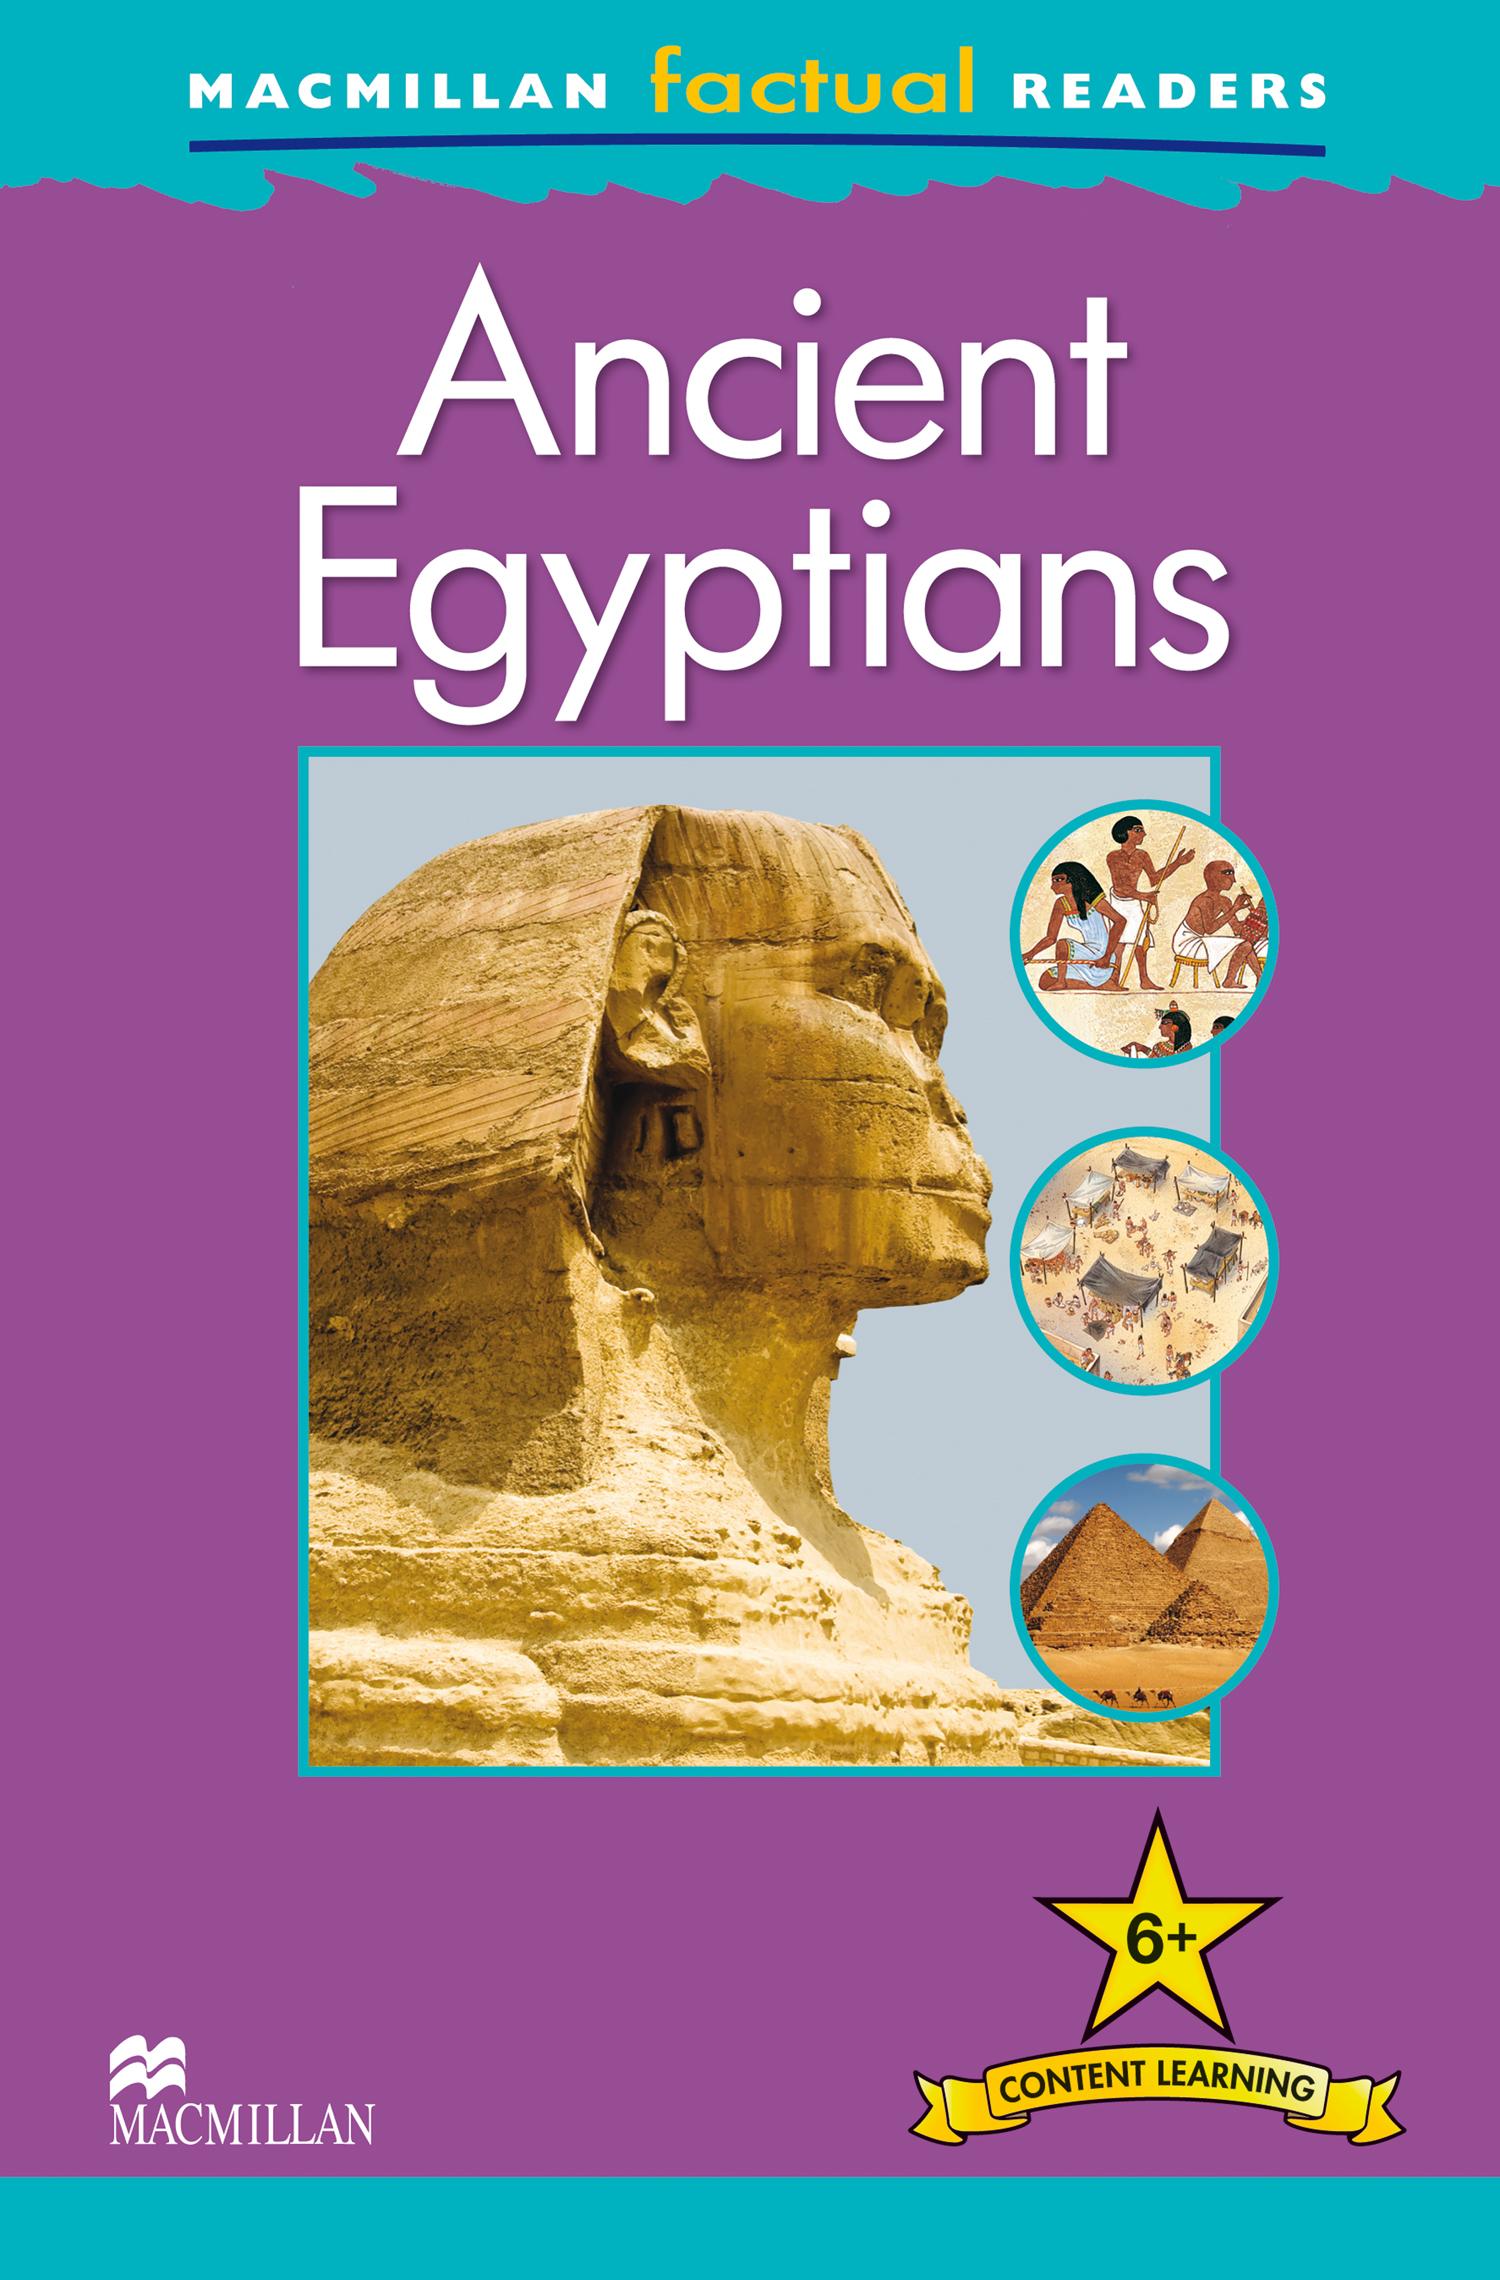 Macmillan Factual Readers: Ancient Egyptians